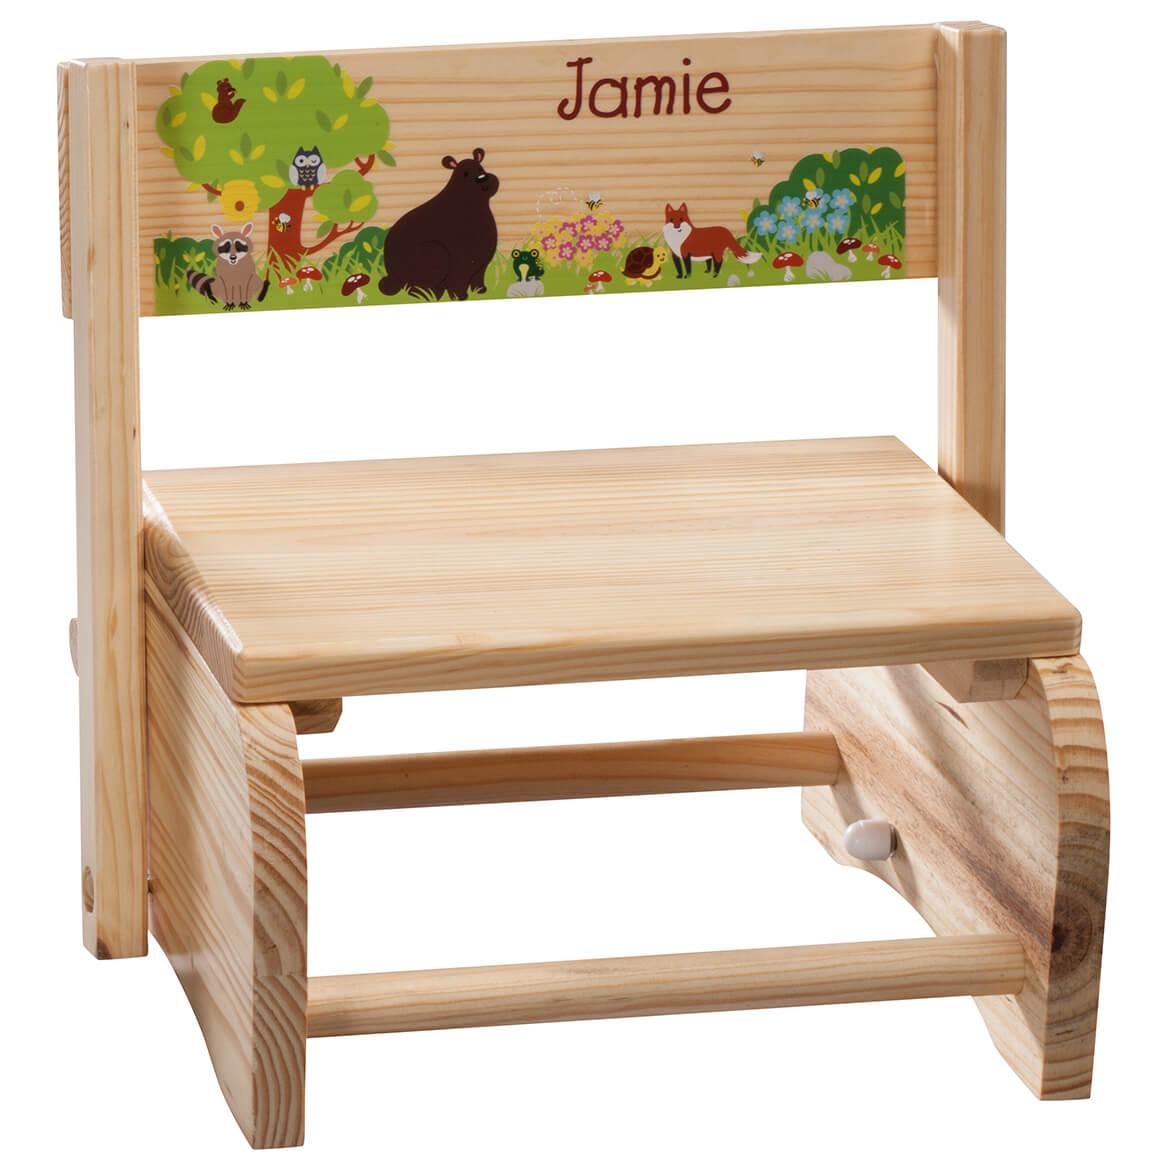 Personalized Children's Woodland Animals Step Stool-365671